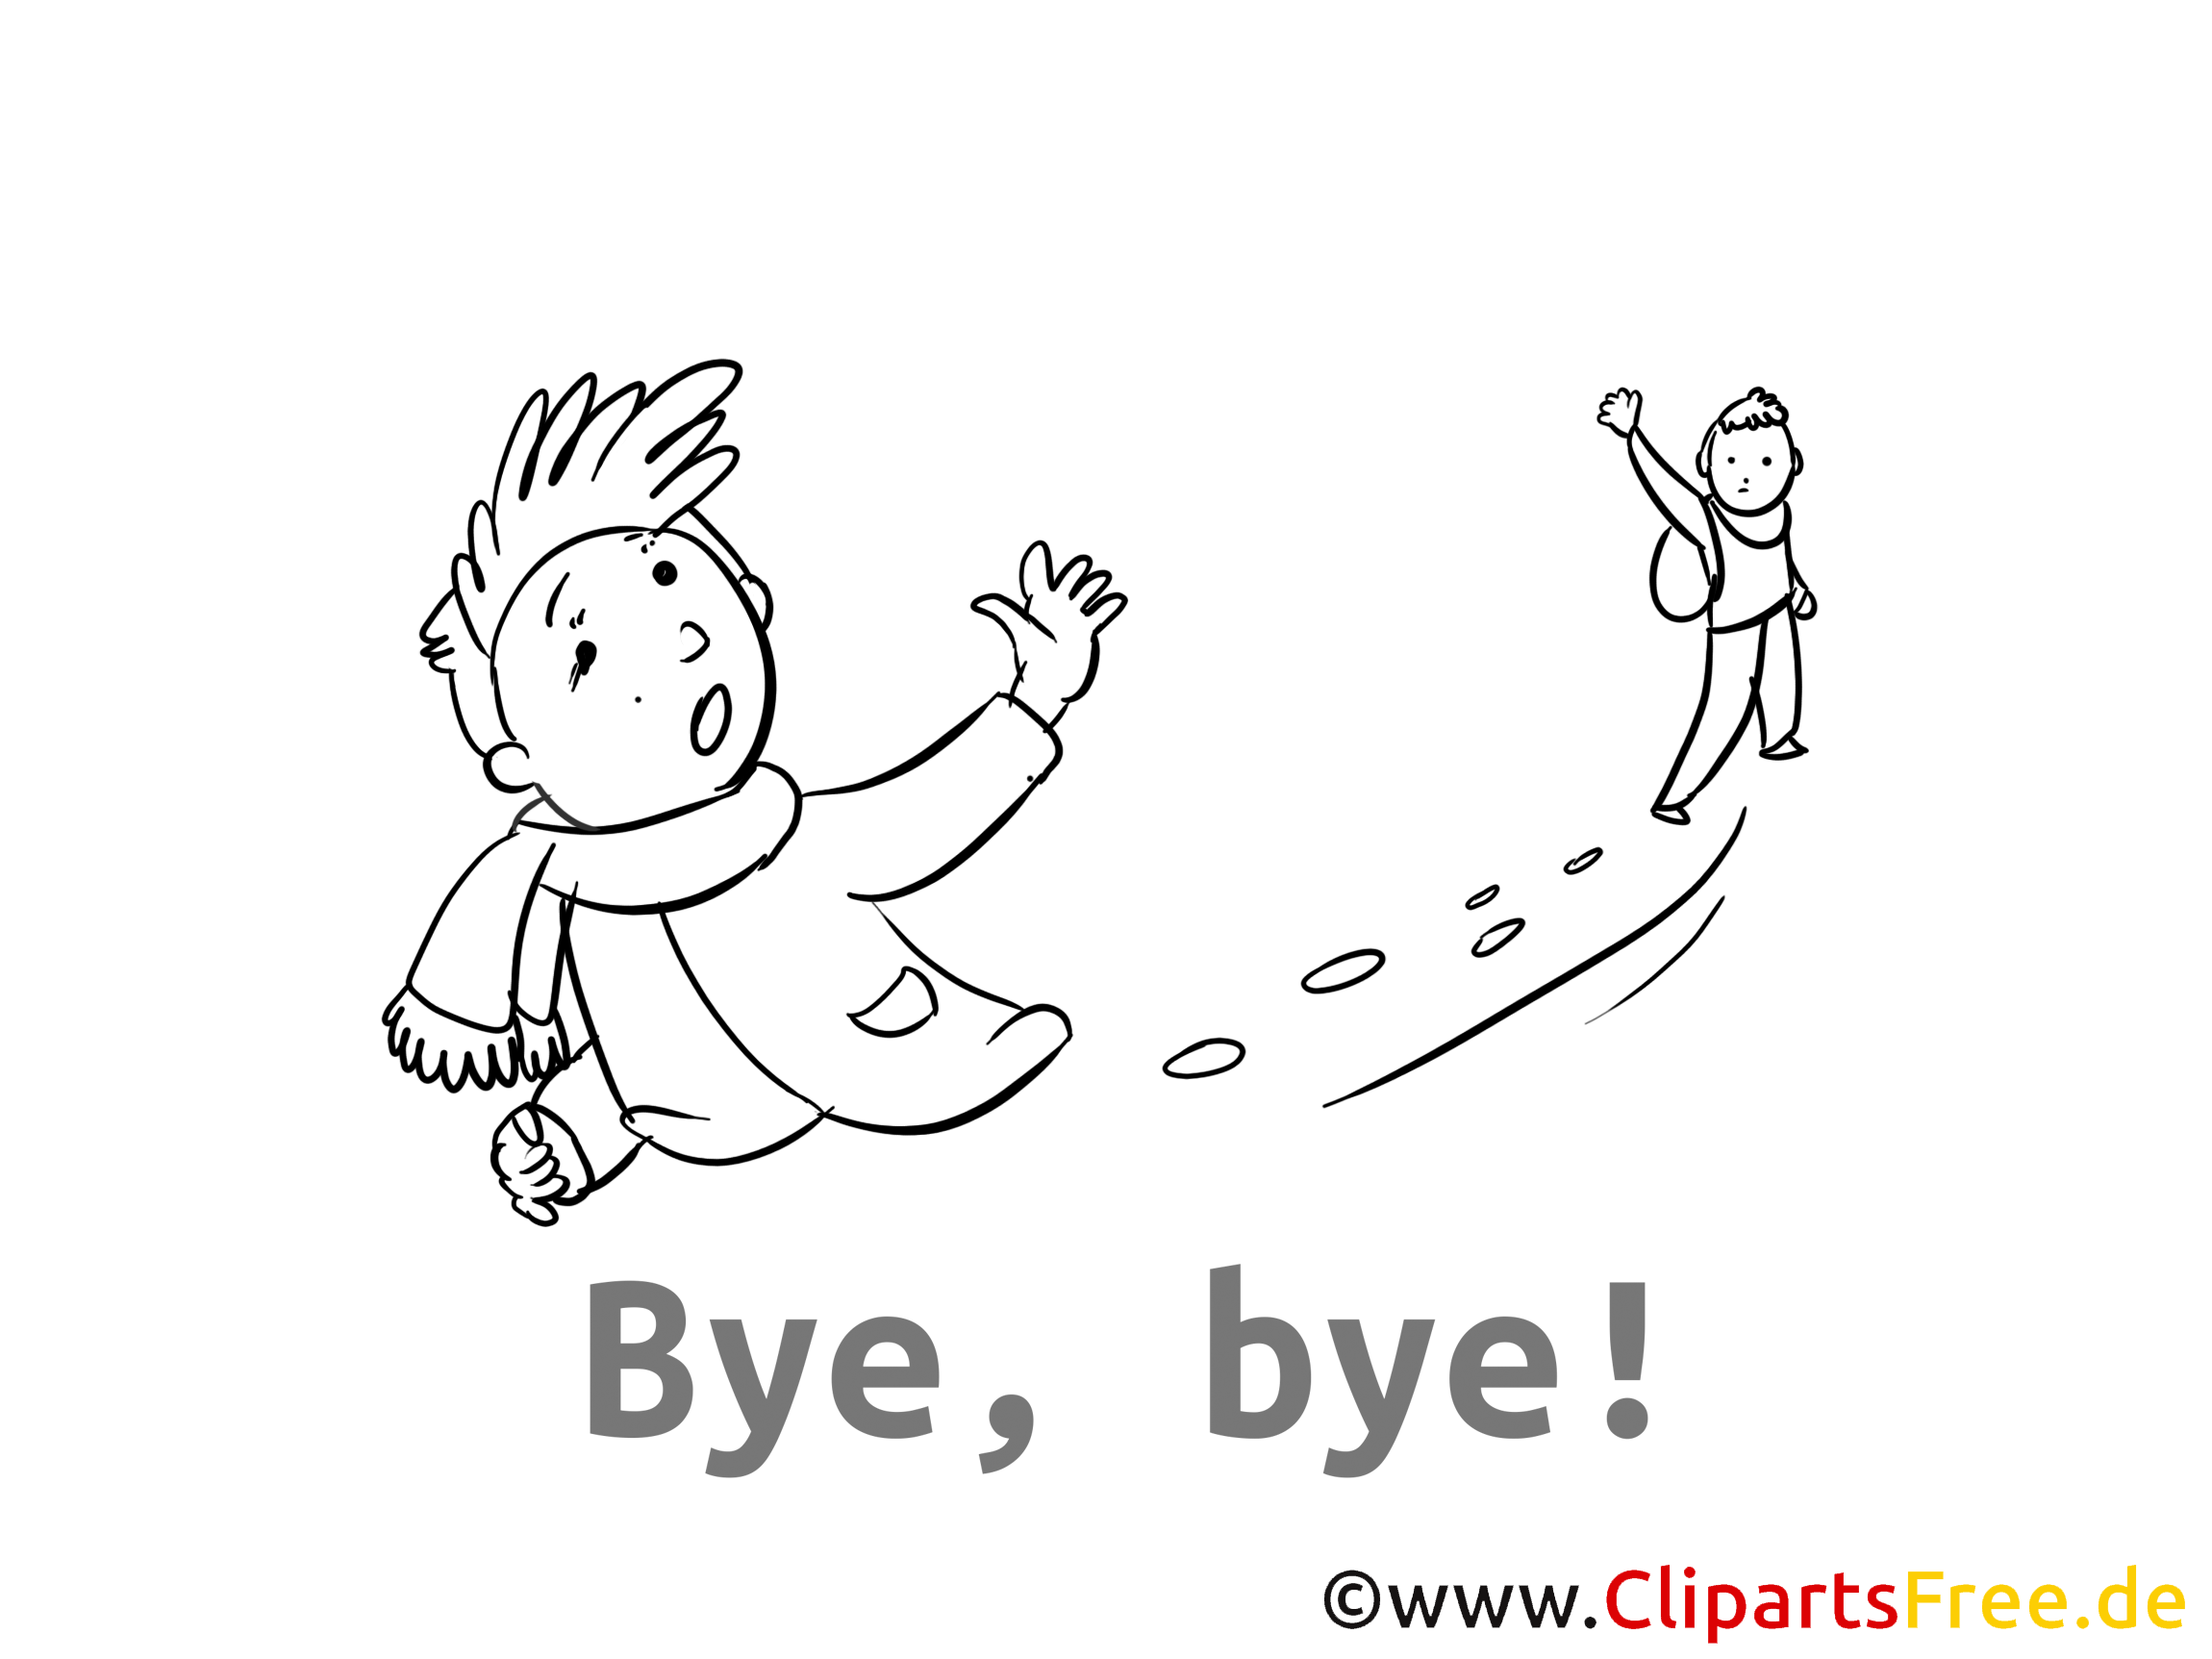 Bye, bye Card, Clip Art, Image